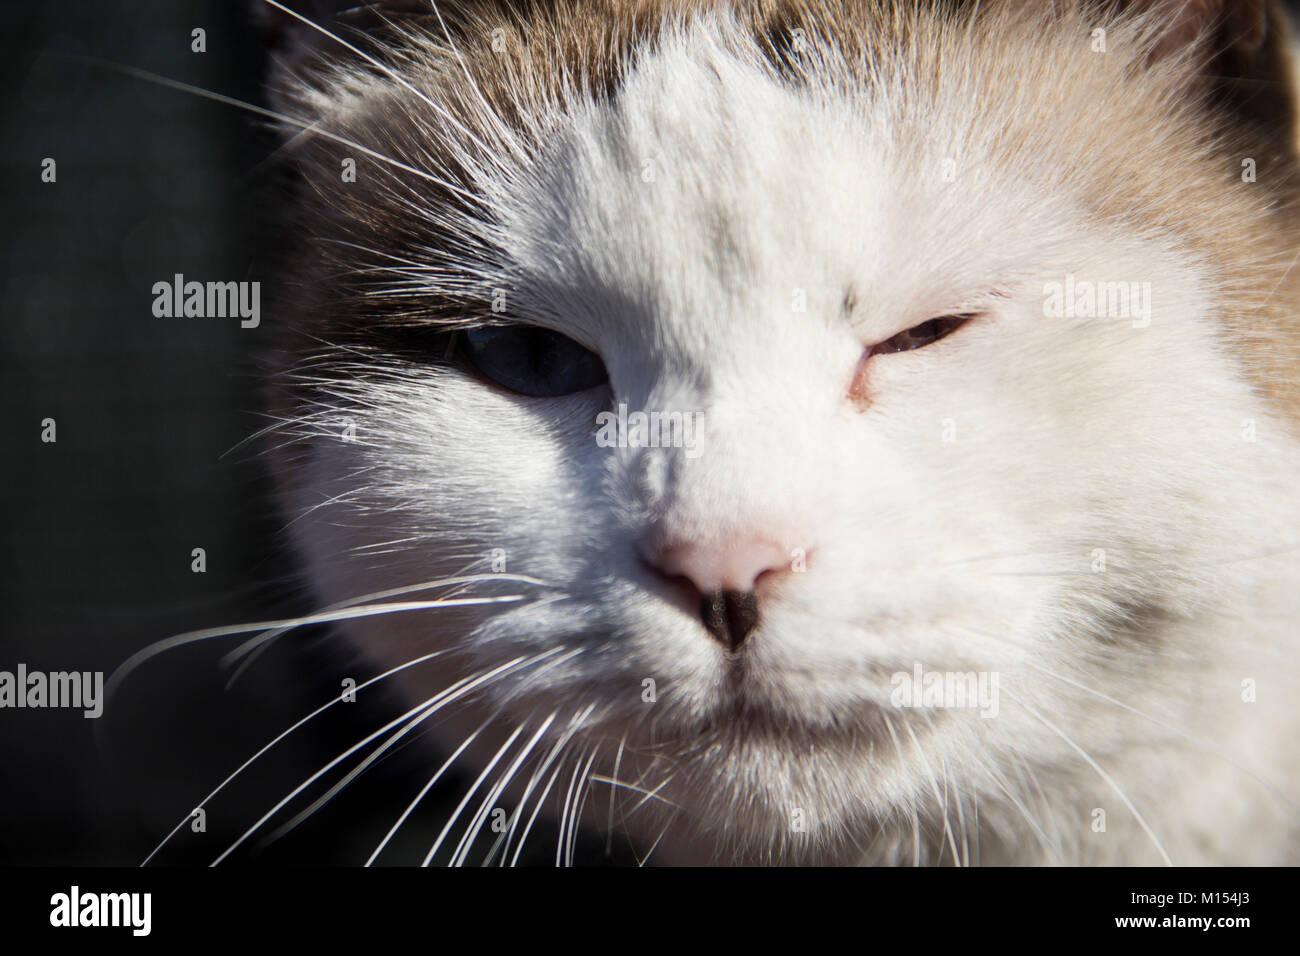 White cat with injured eye - Stock Image